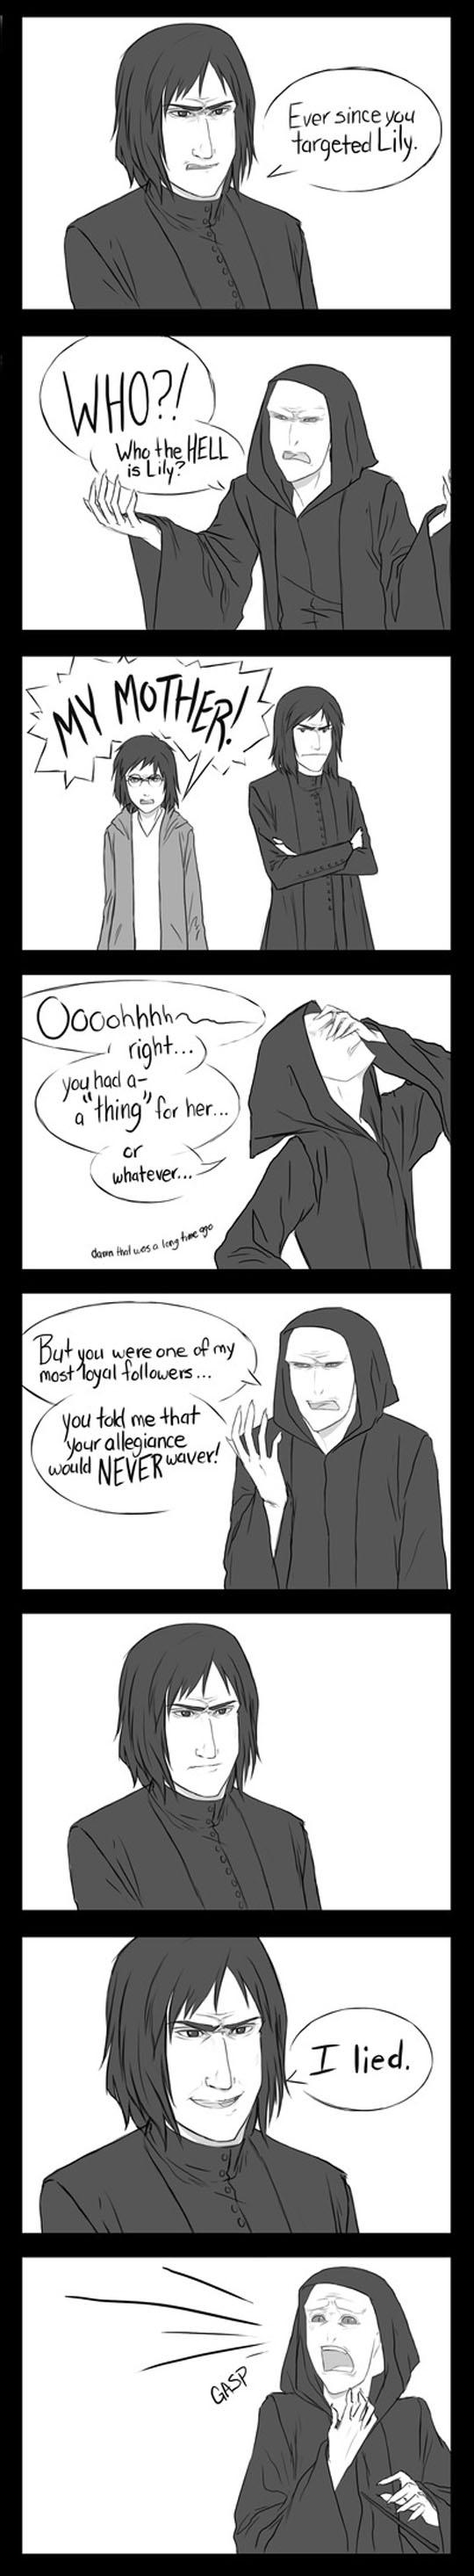 funny-Harry-Potter-comic-Snape-Voldemort-loyalty